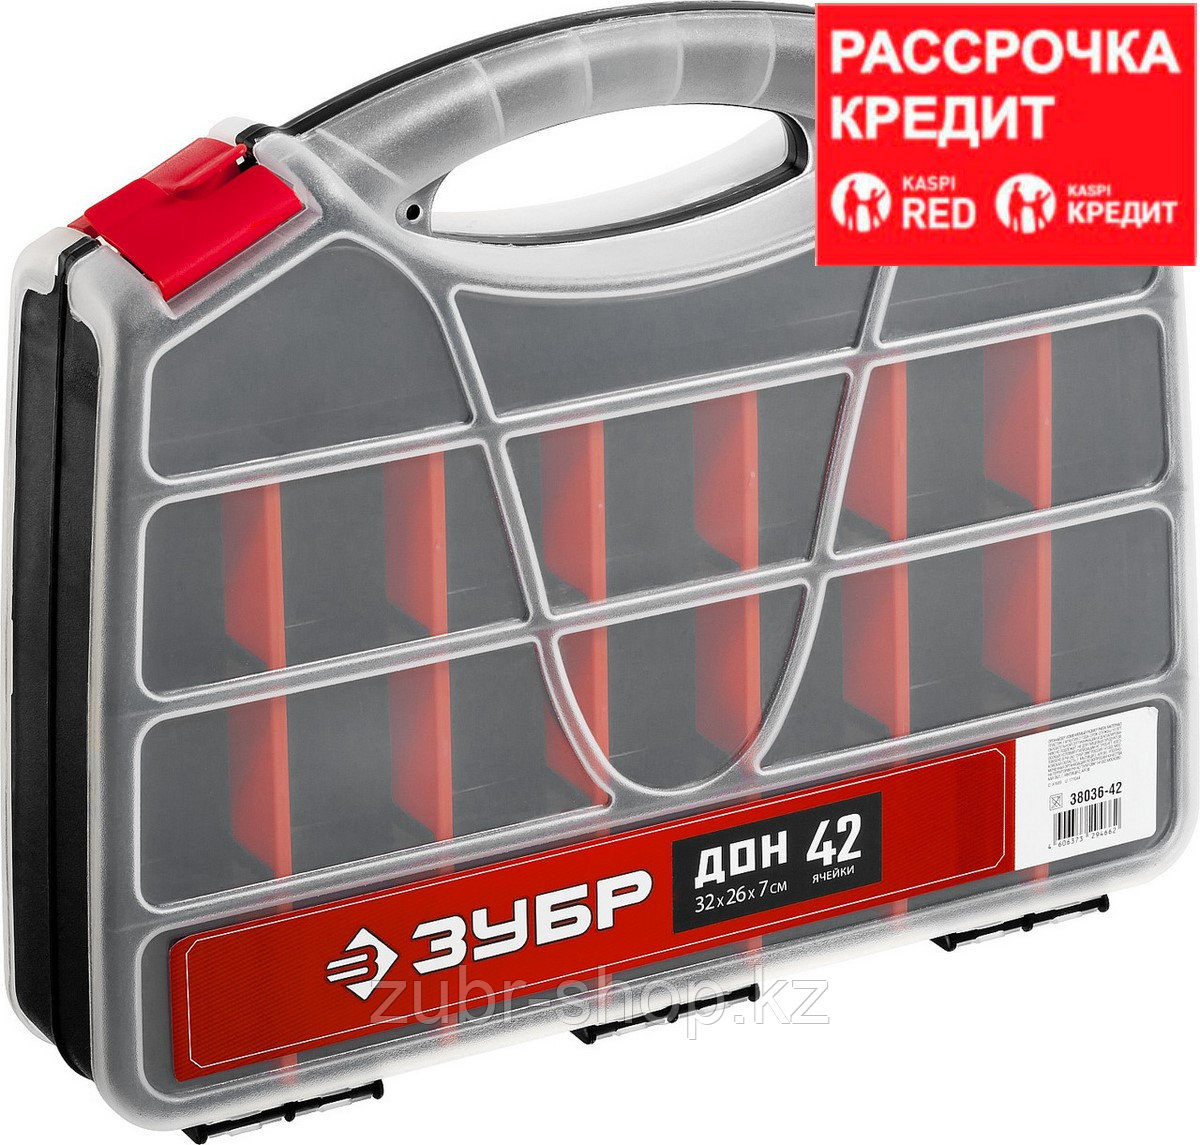 "Органайзер ""ДОН-42"" двухсторонний, ЗУБР (38036-42)"